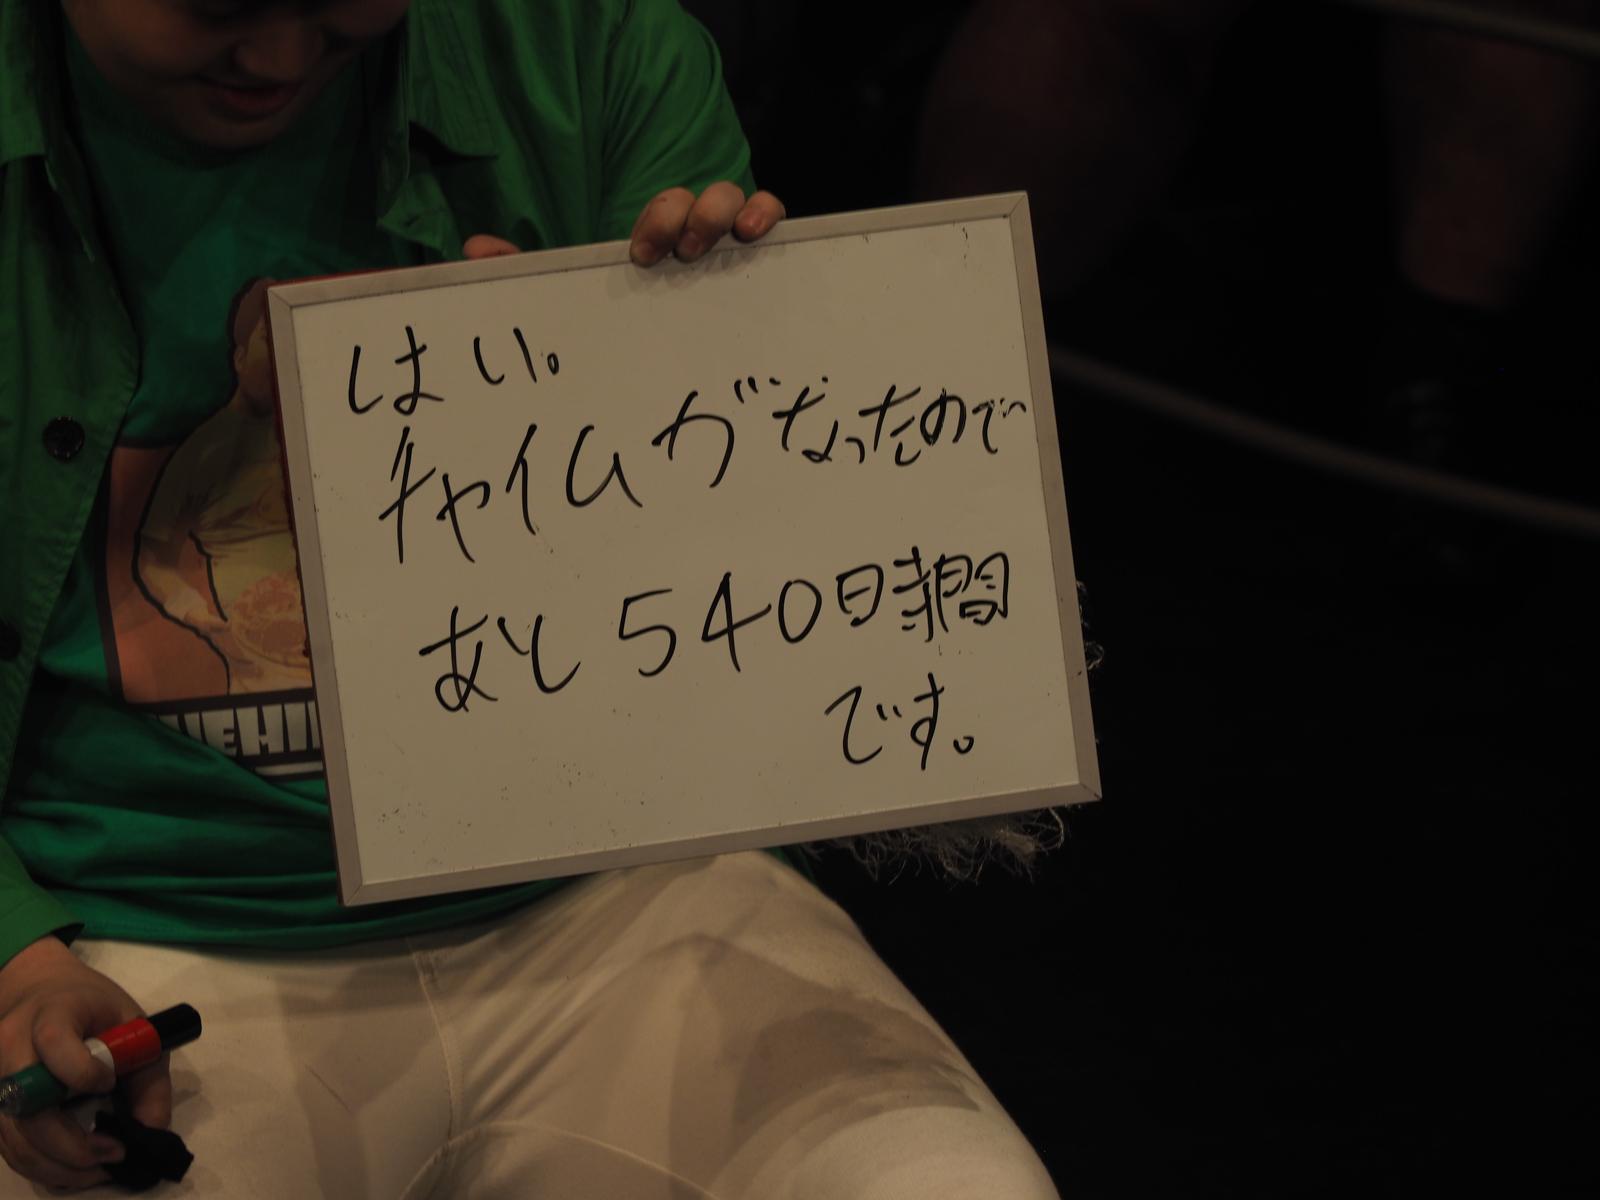 f:id:motomachi24:20170226194919j:plain